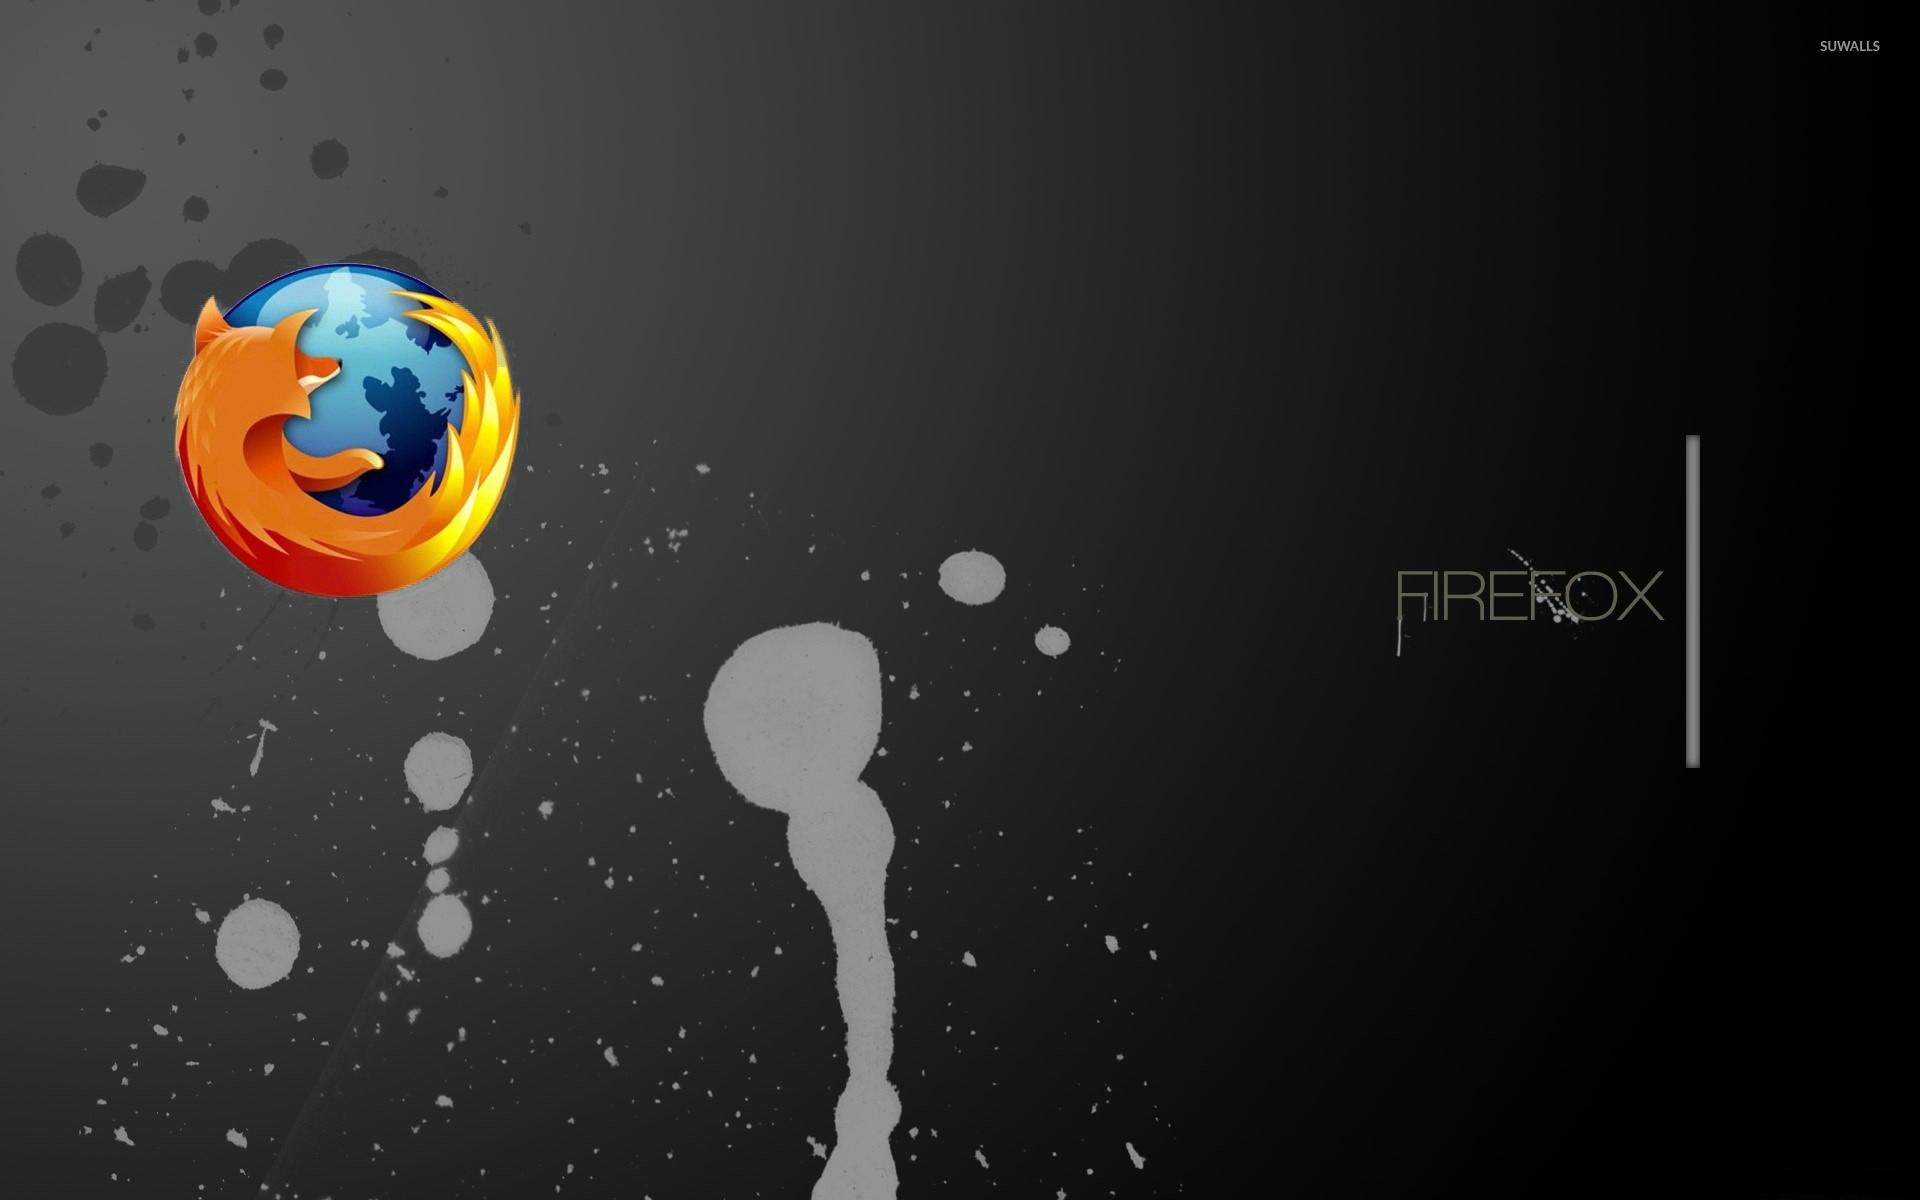 Mozilla Firefox On Paint Splash Wallpaper